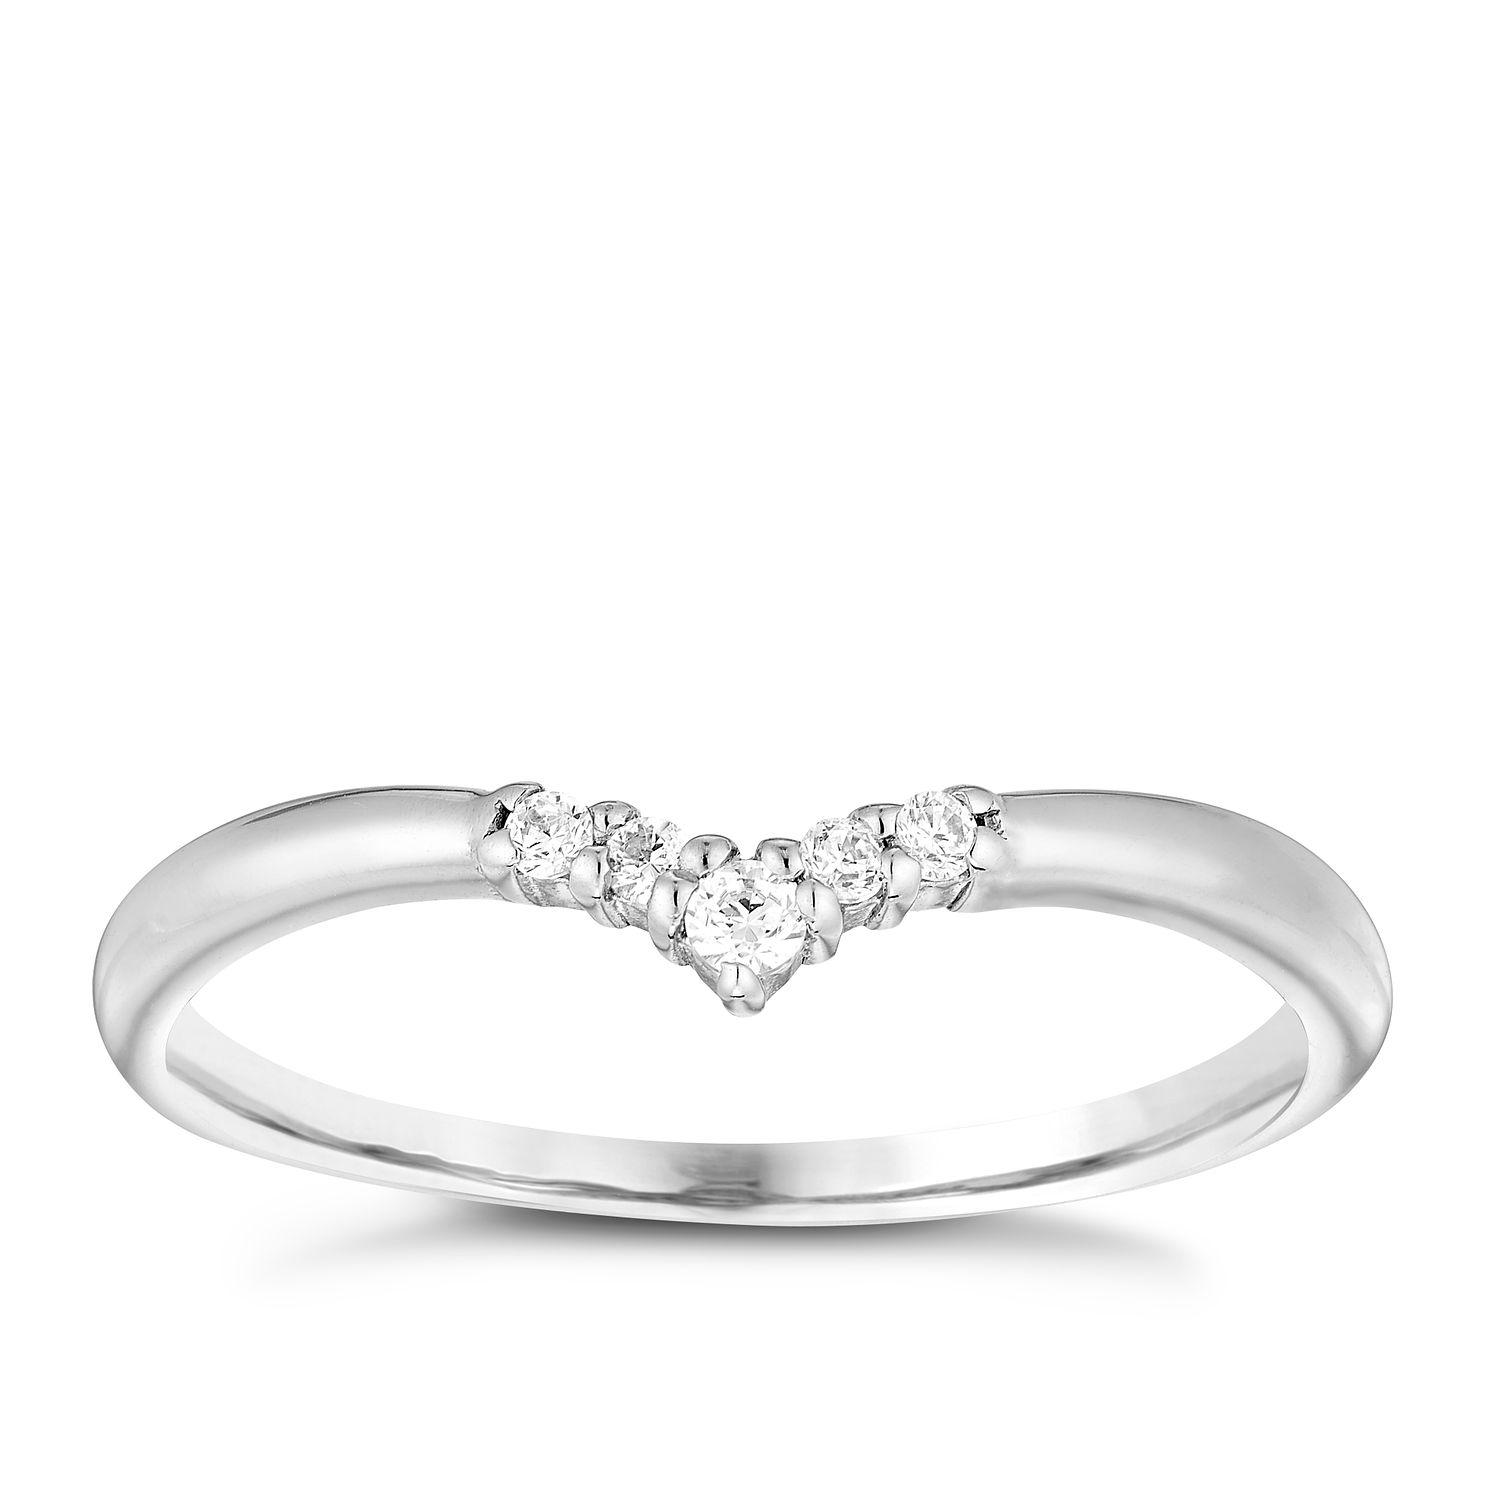 Rings - Engagement Rings & Wedding Rings   H.Samuel